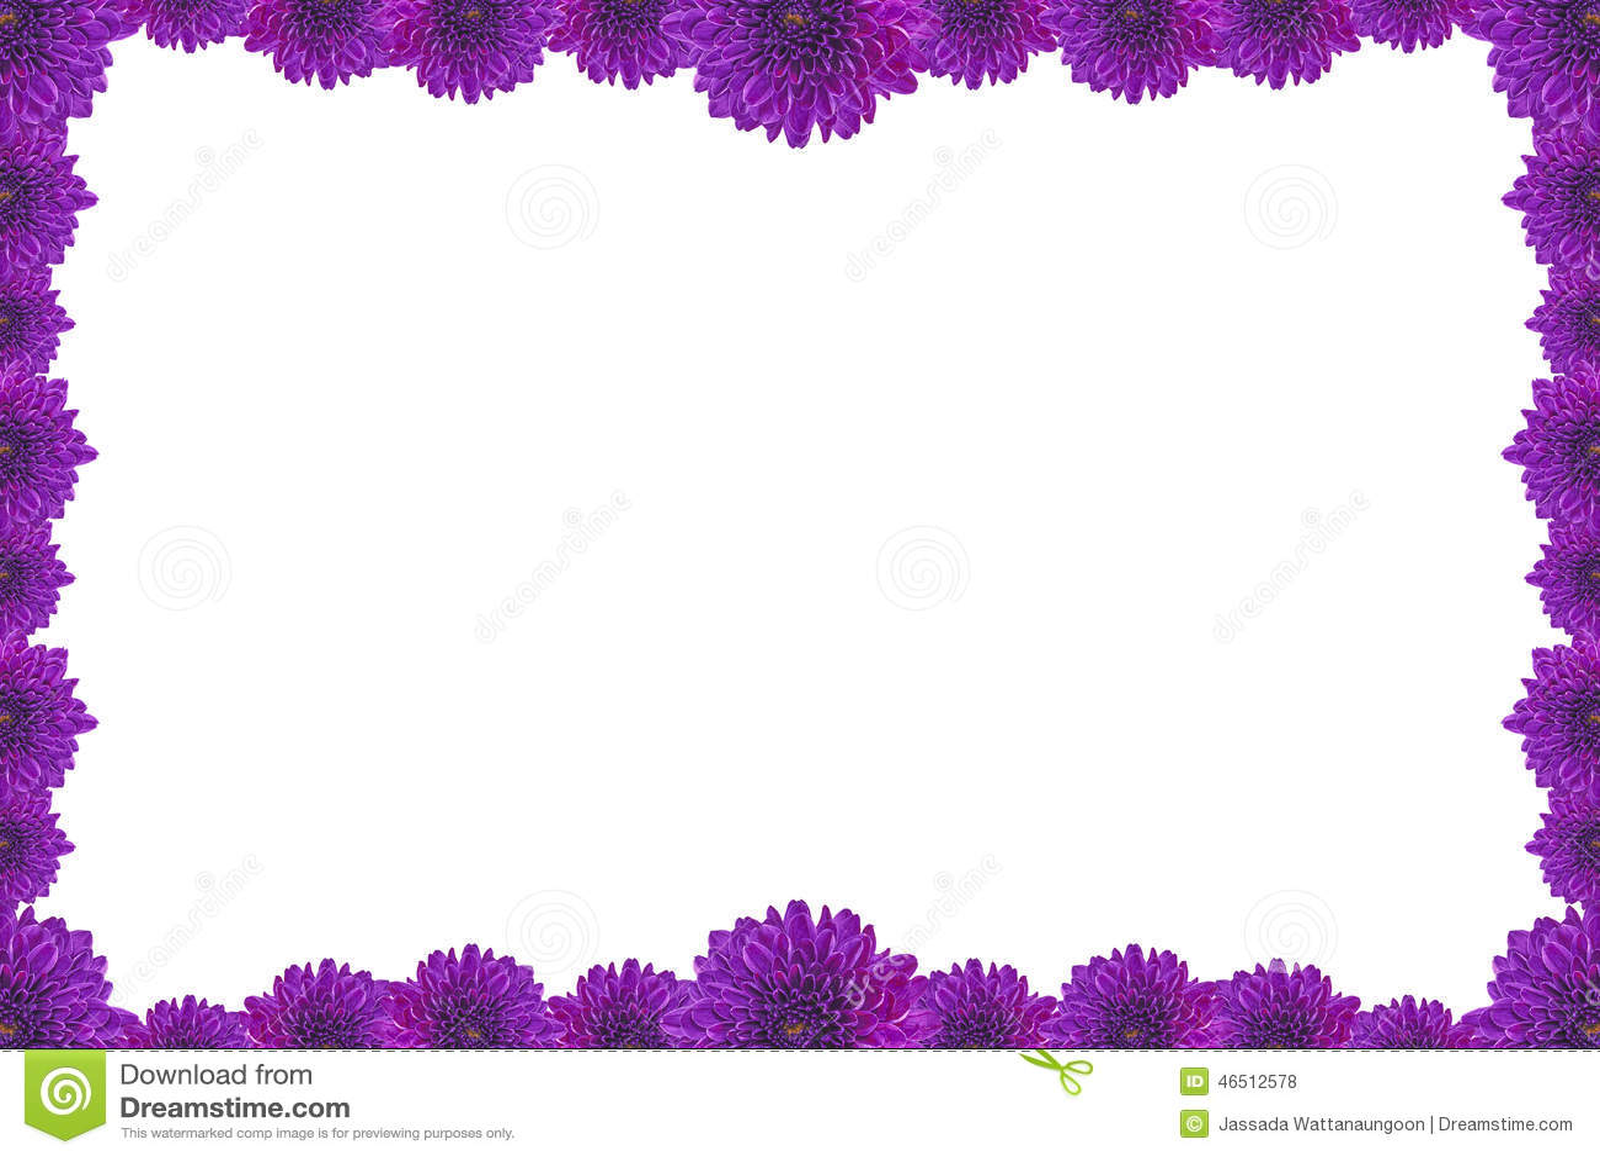 image vectorielle gratuite illustrator k2kF6OOa